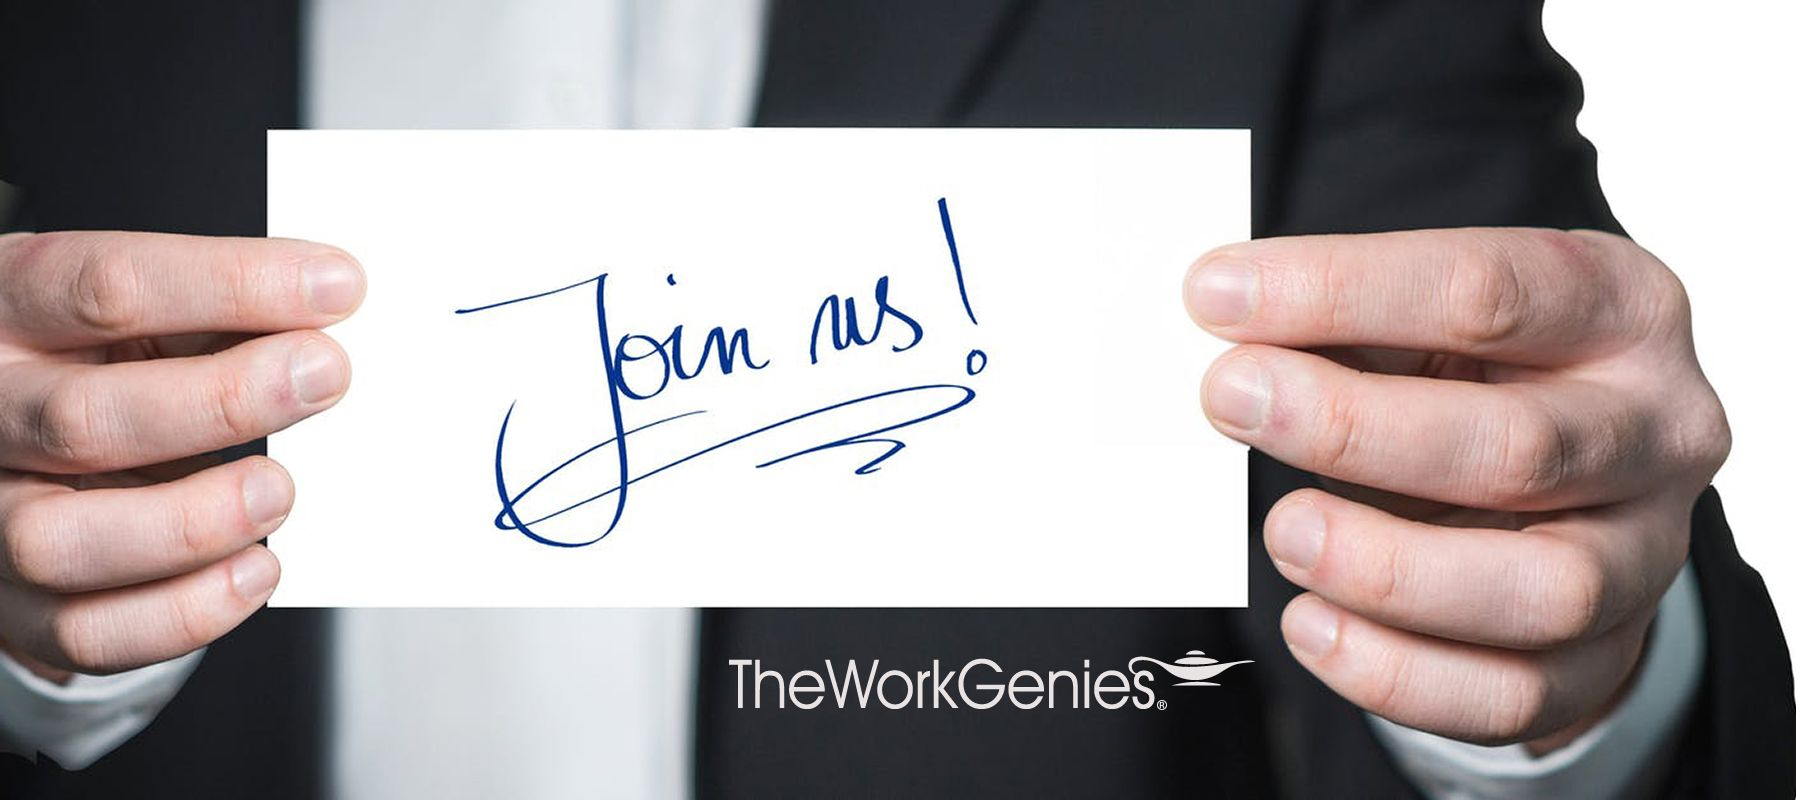 Get top jobs in dubai 2019 with TheWorkGenies